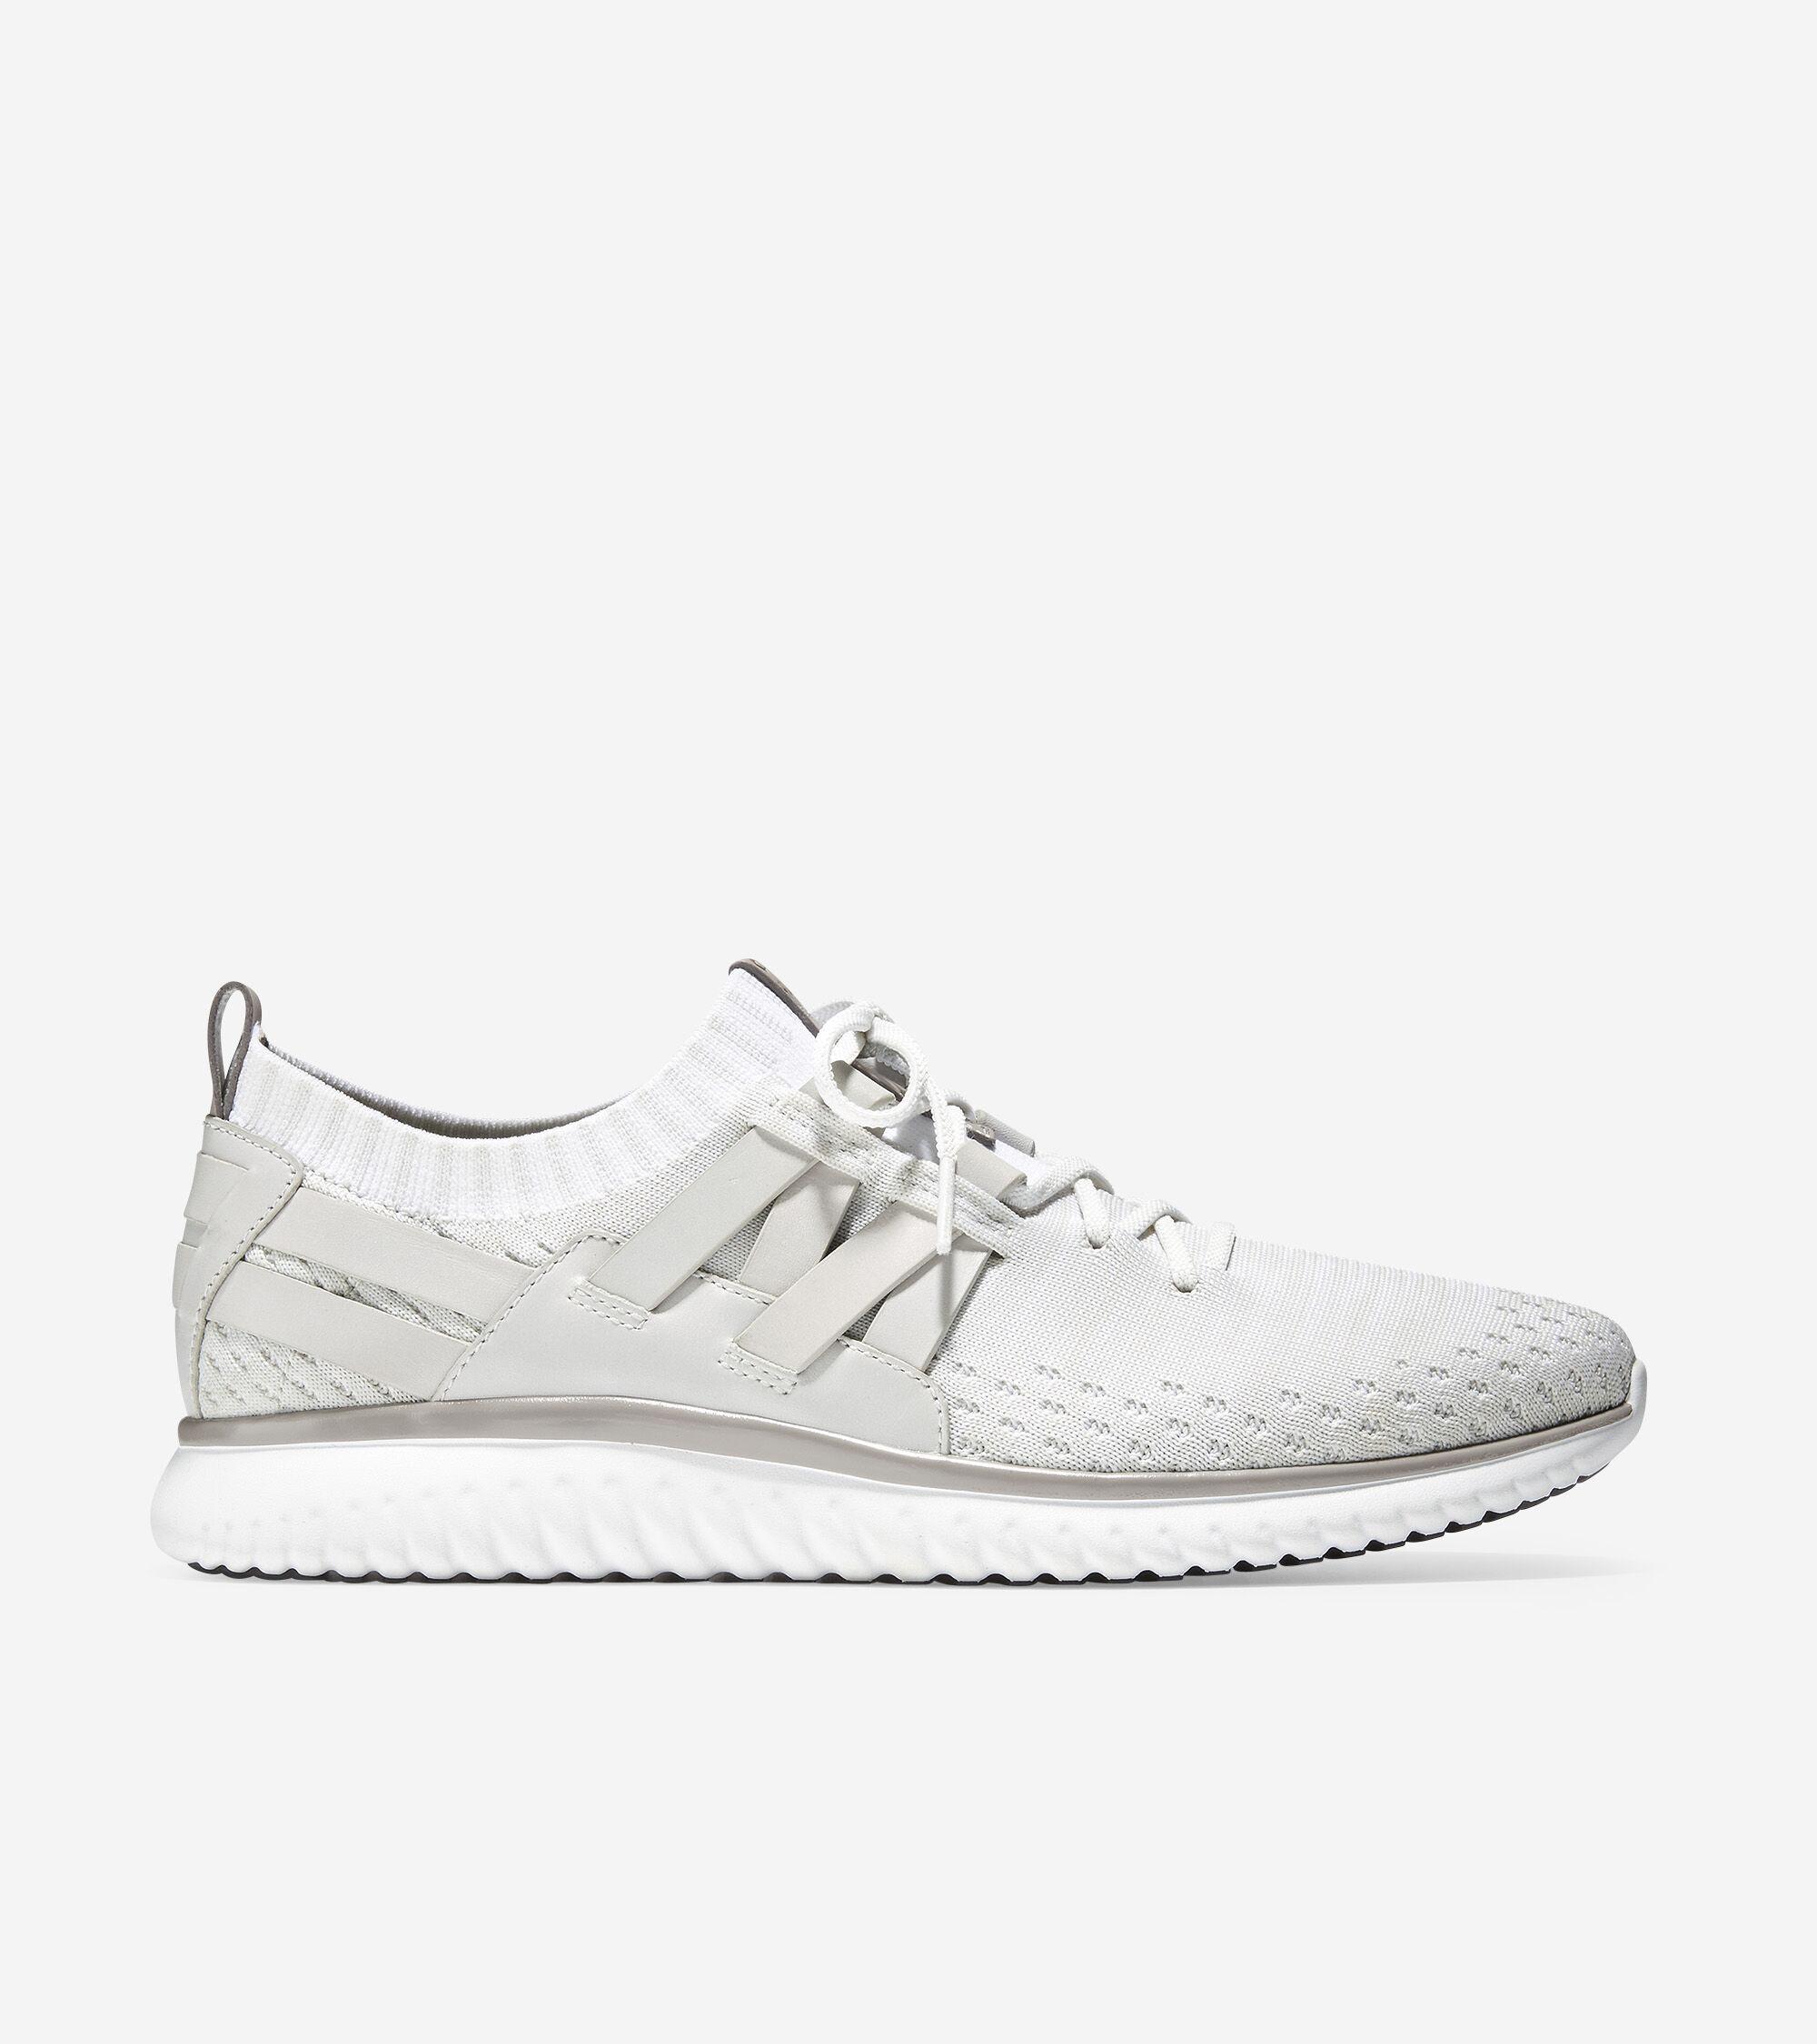 Woven Sneaker in Optic White Stitchlite